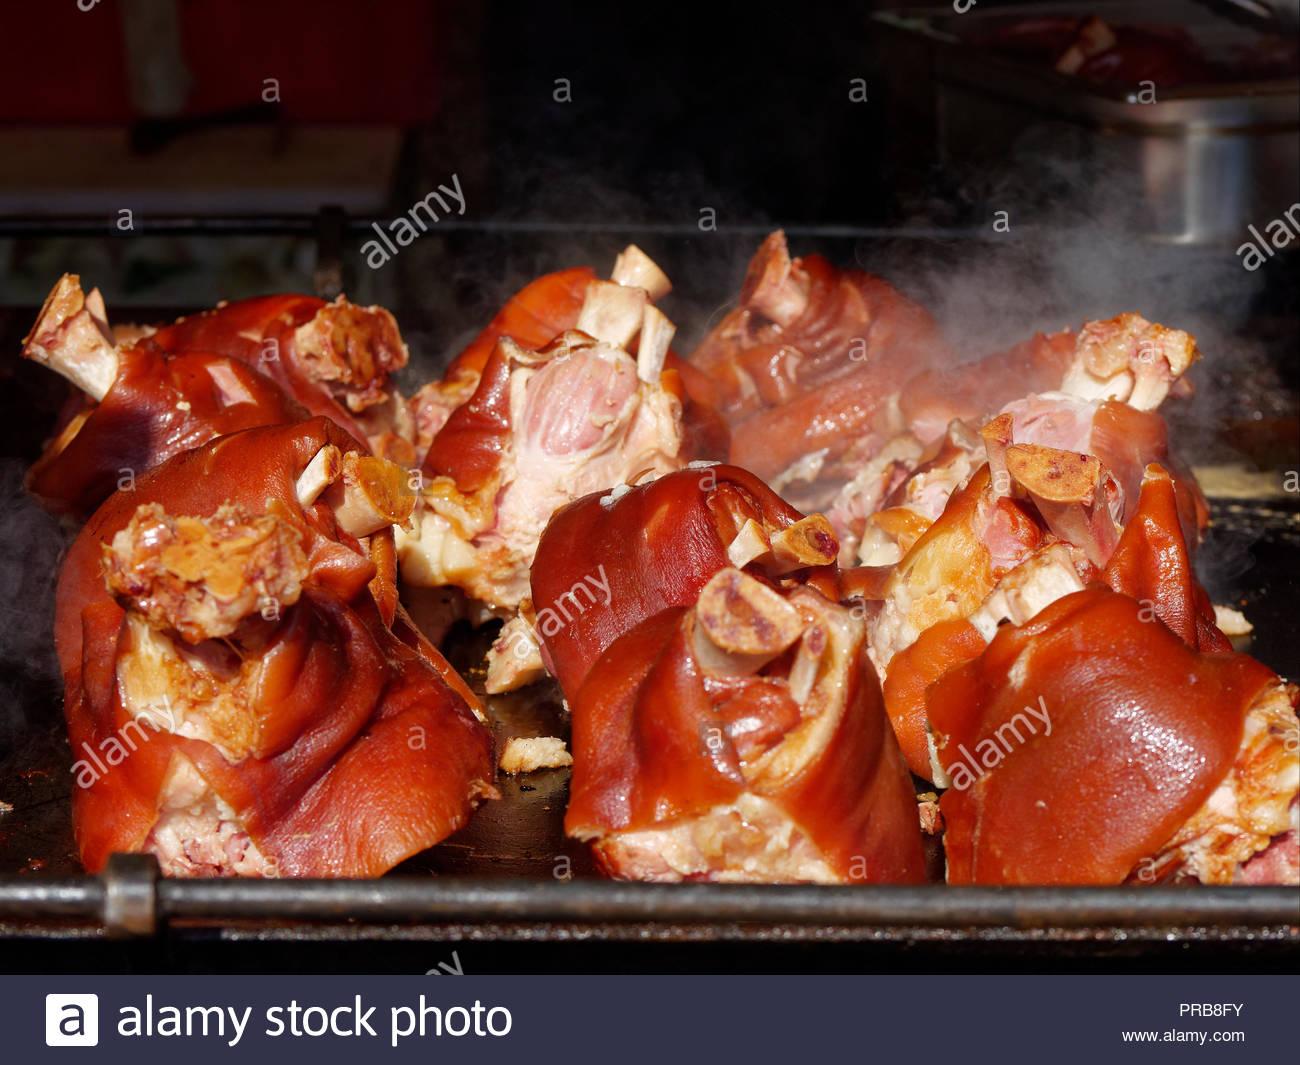 Pork knuckle on grill, European cuisine - Stock Image